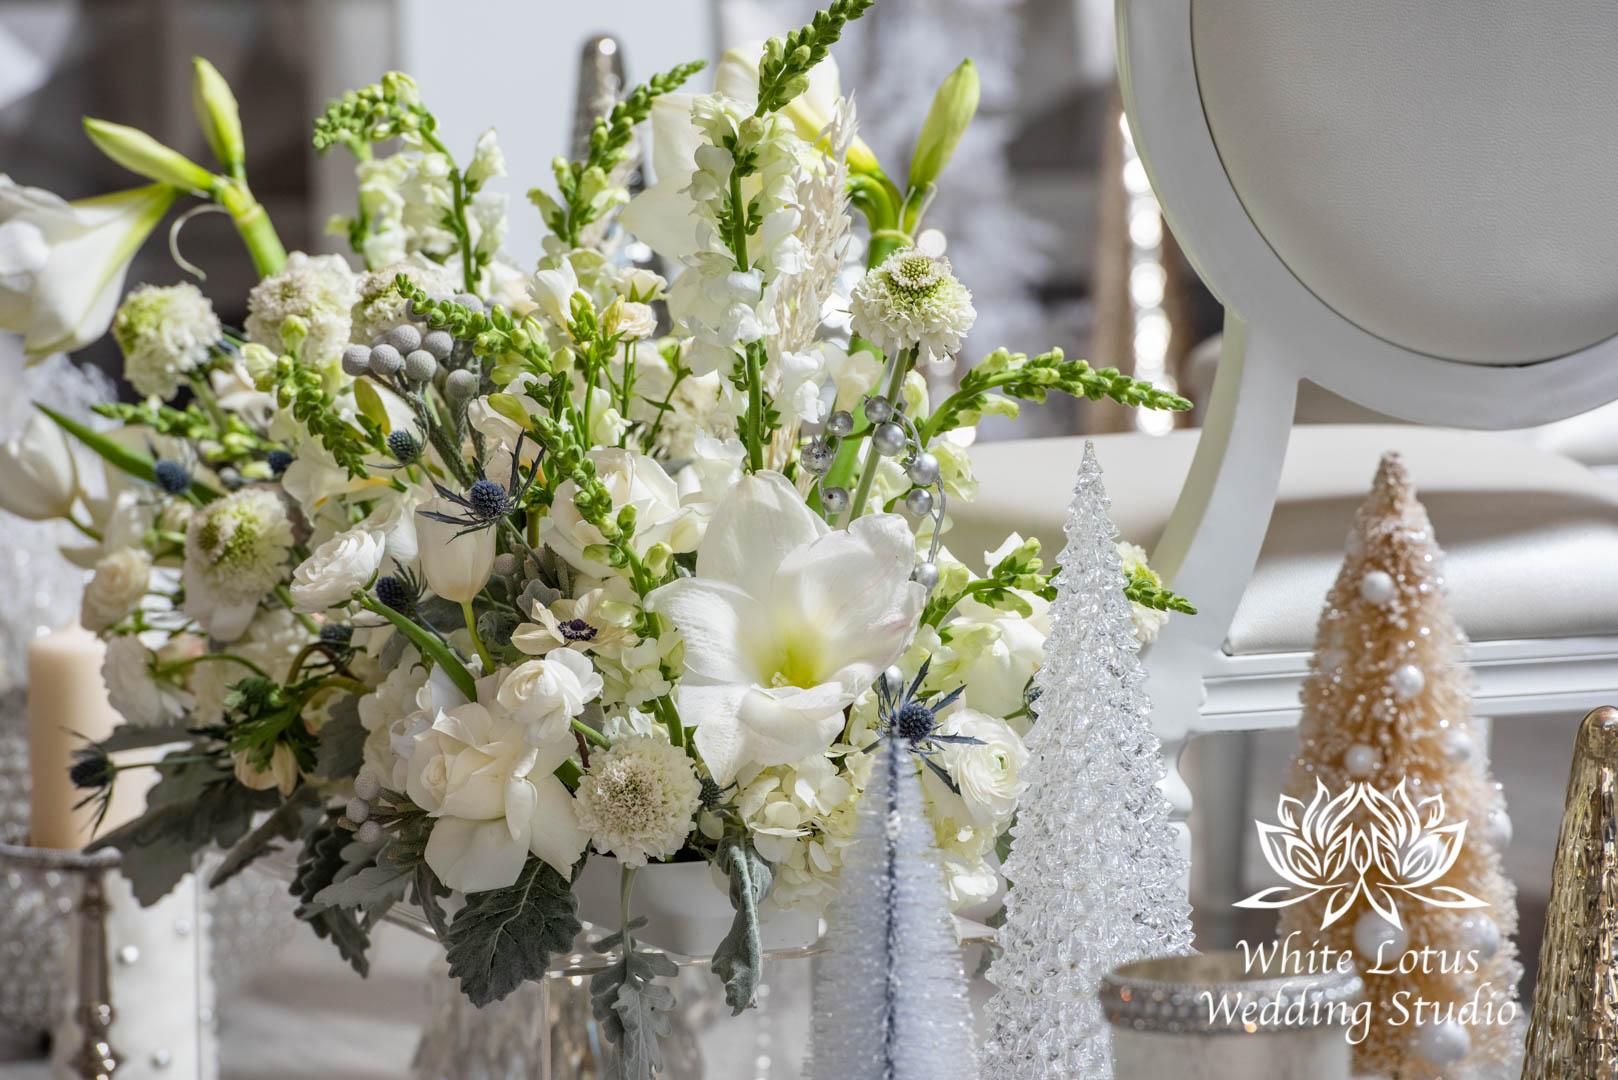 030- GLAM WINTERLUXE WEDDING INSPIRATION